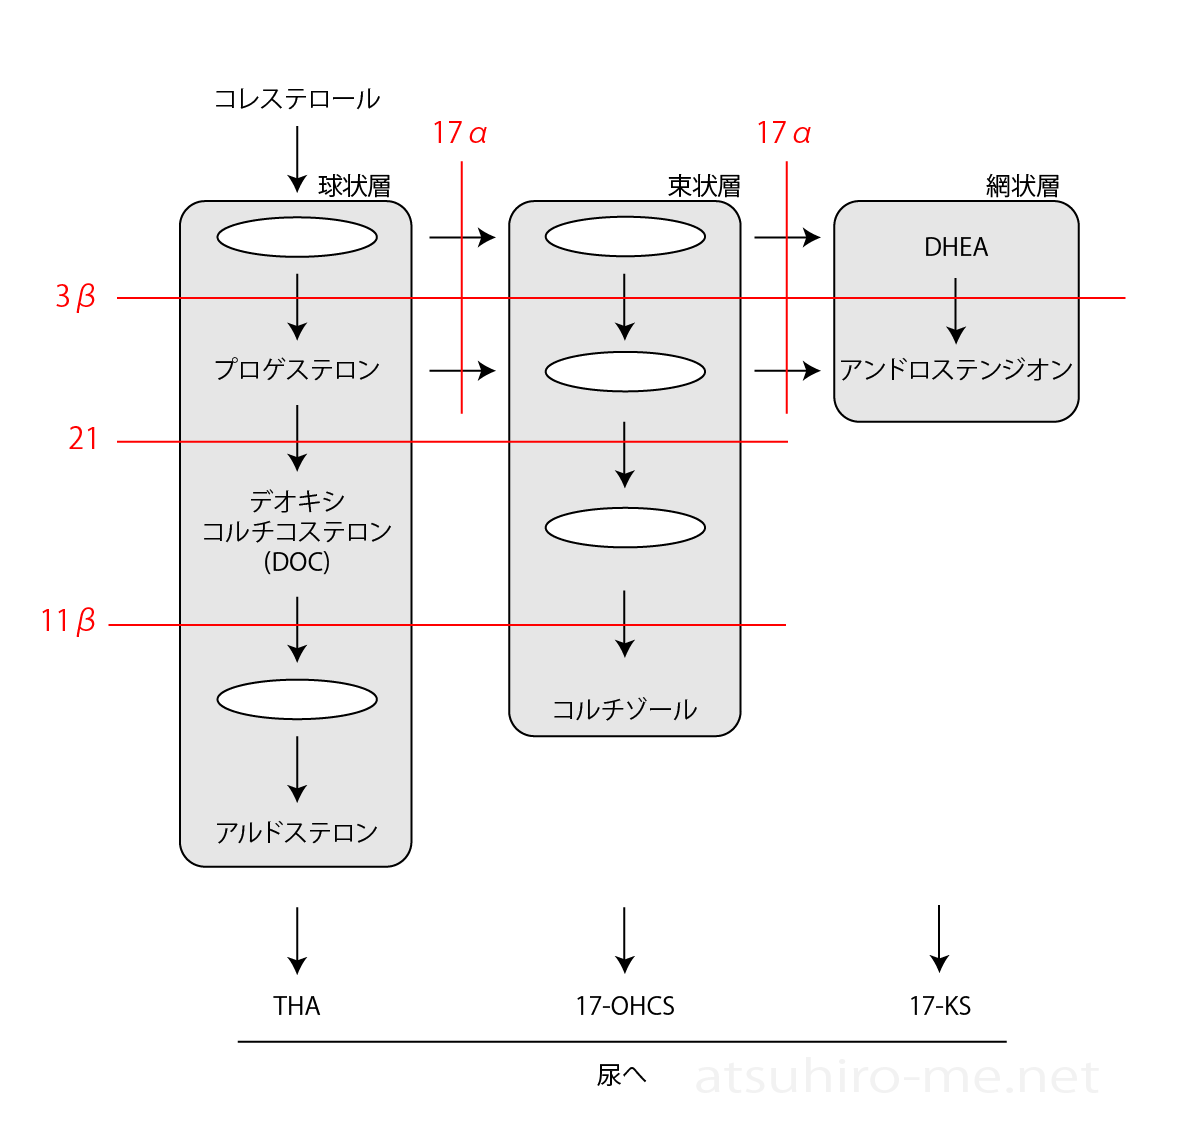 f:id:atsuhiro-me:20160121100026p:plain:w300